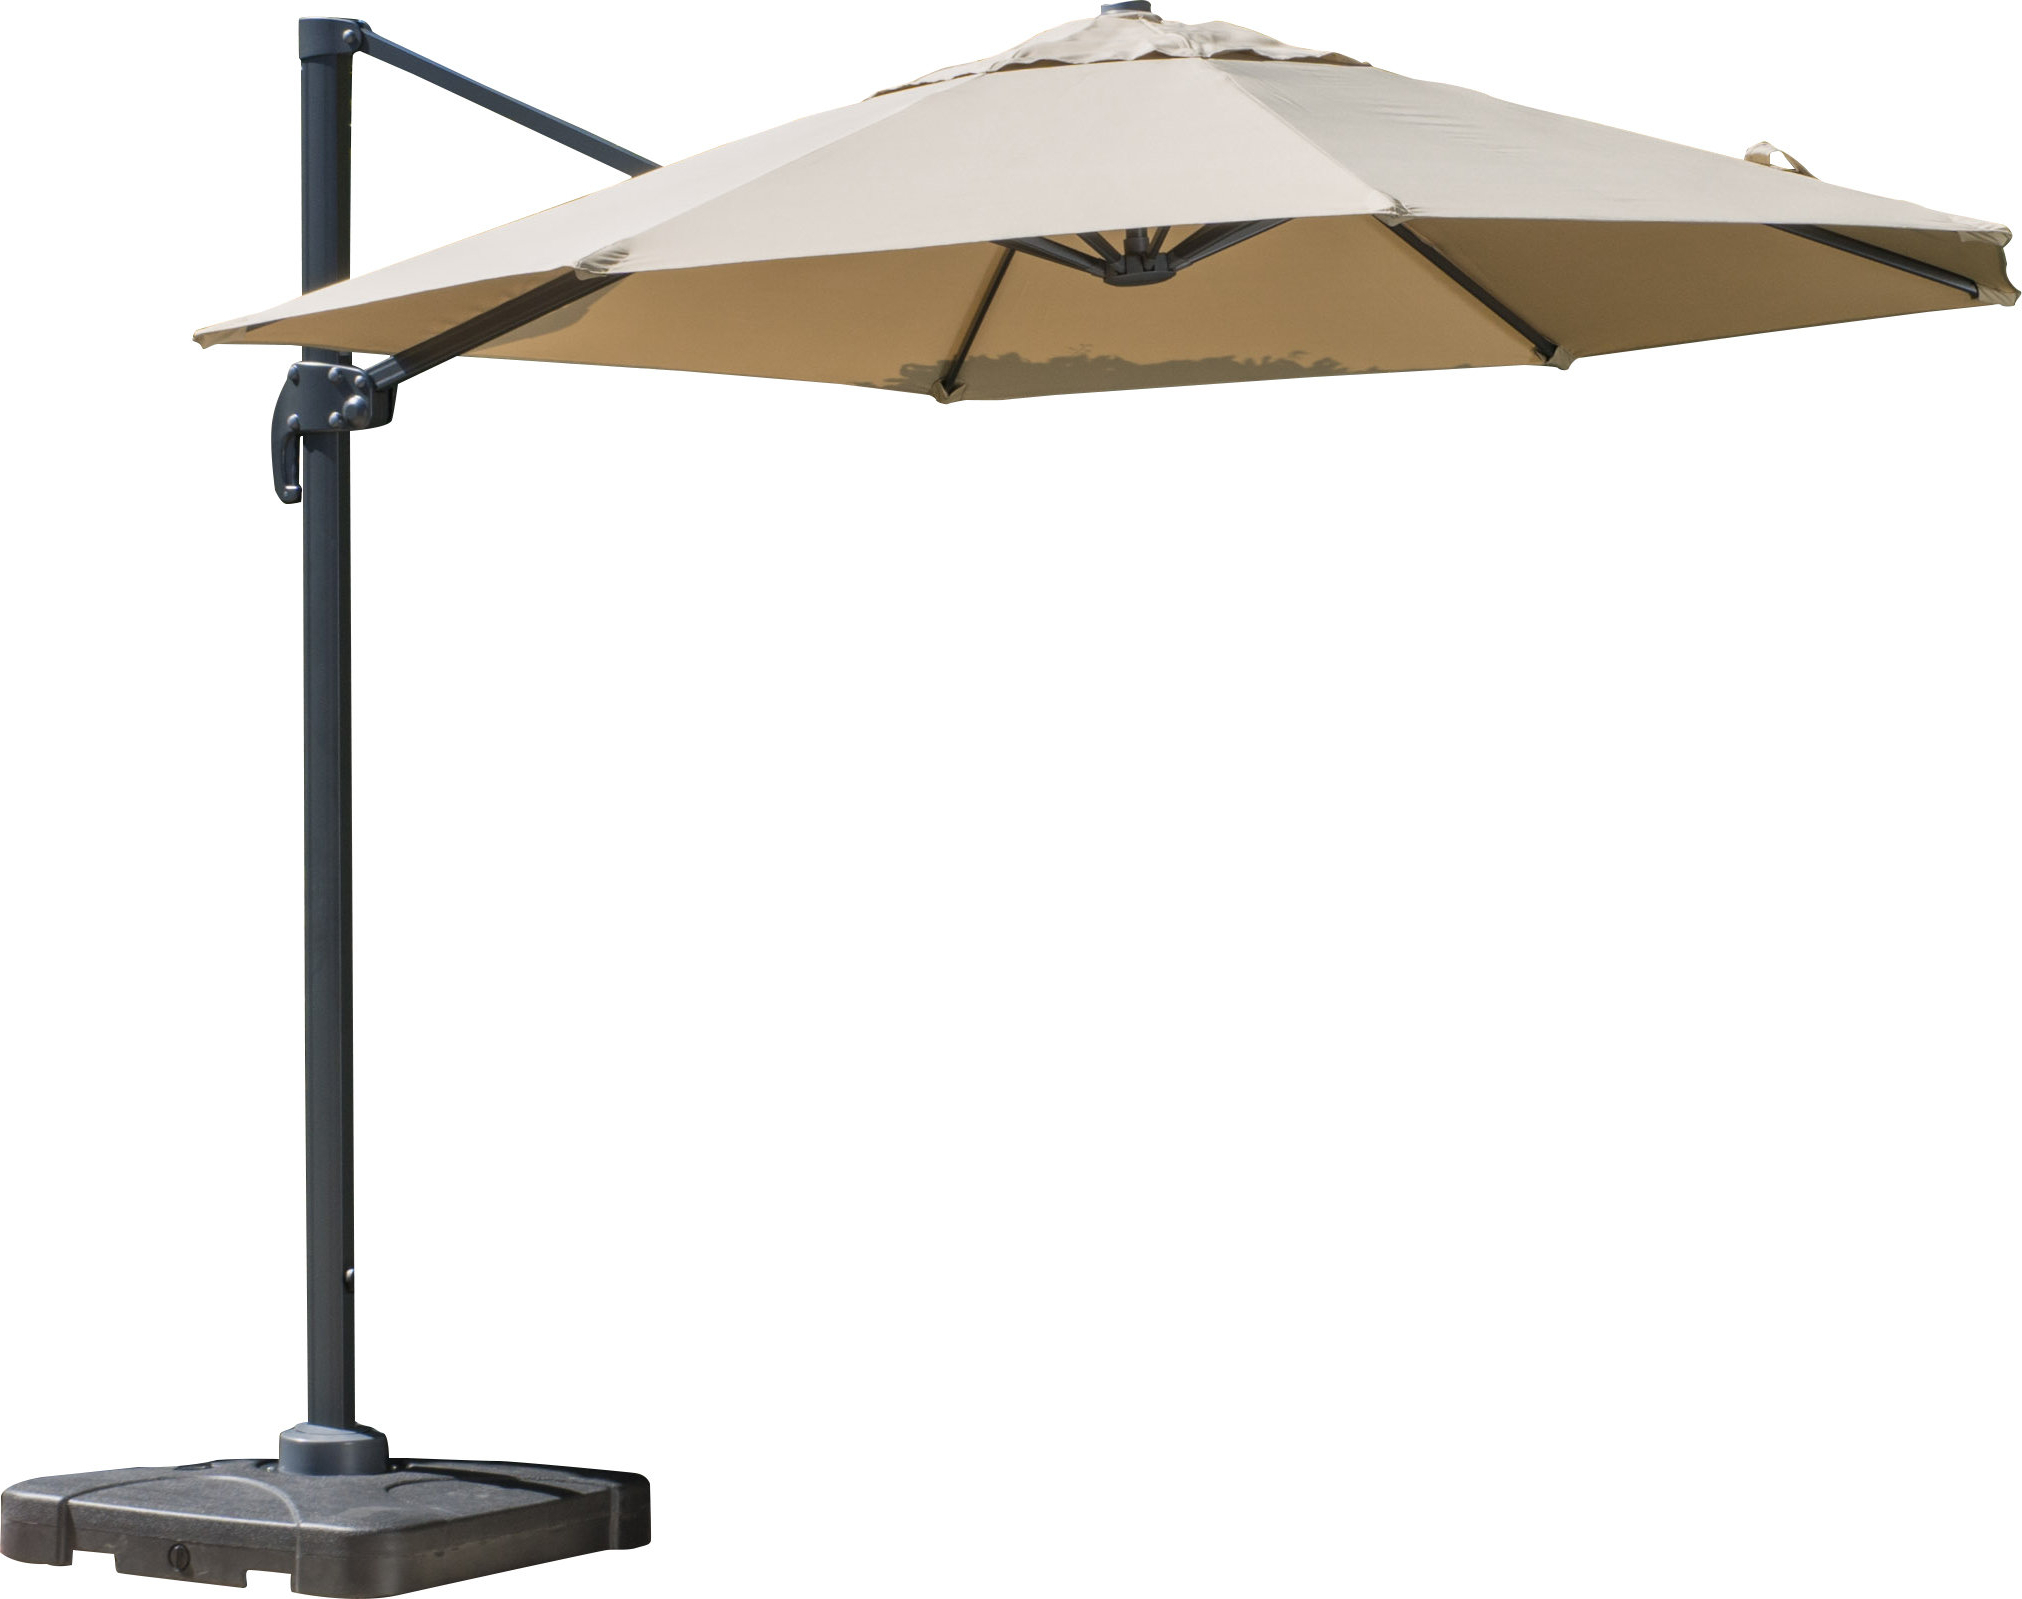 Bondi Square Cantilever Umbrellas Inside Well Known Bellana Cantilever Umbrella (Gallery 7 of 20)